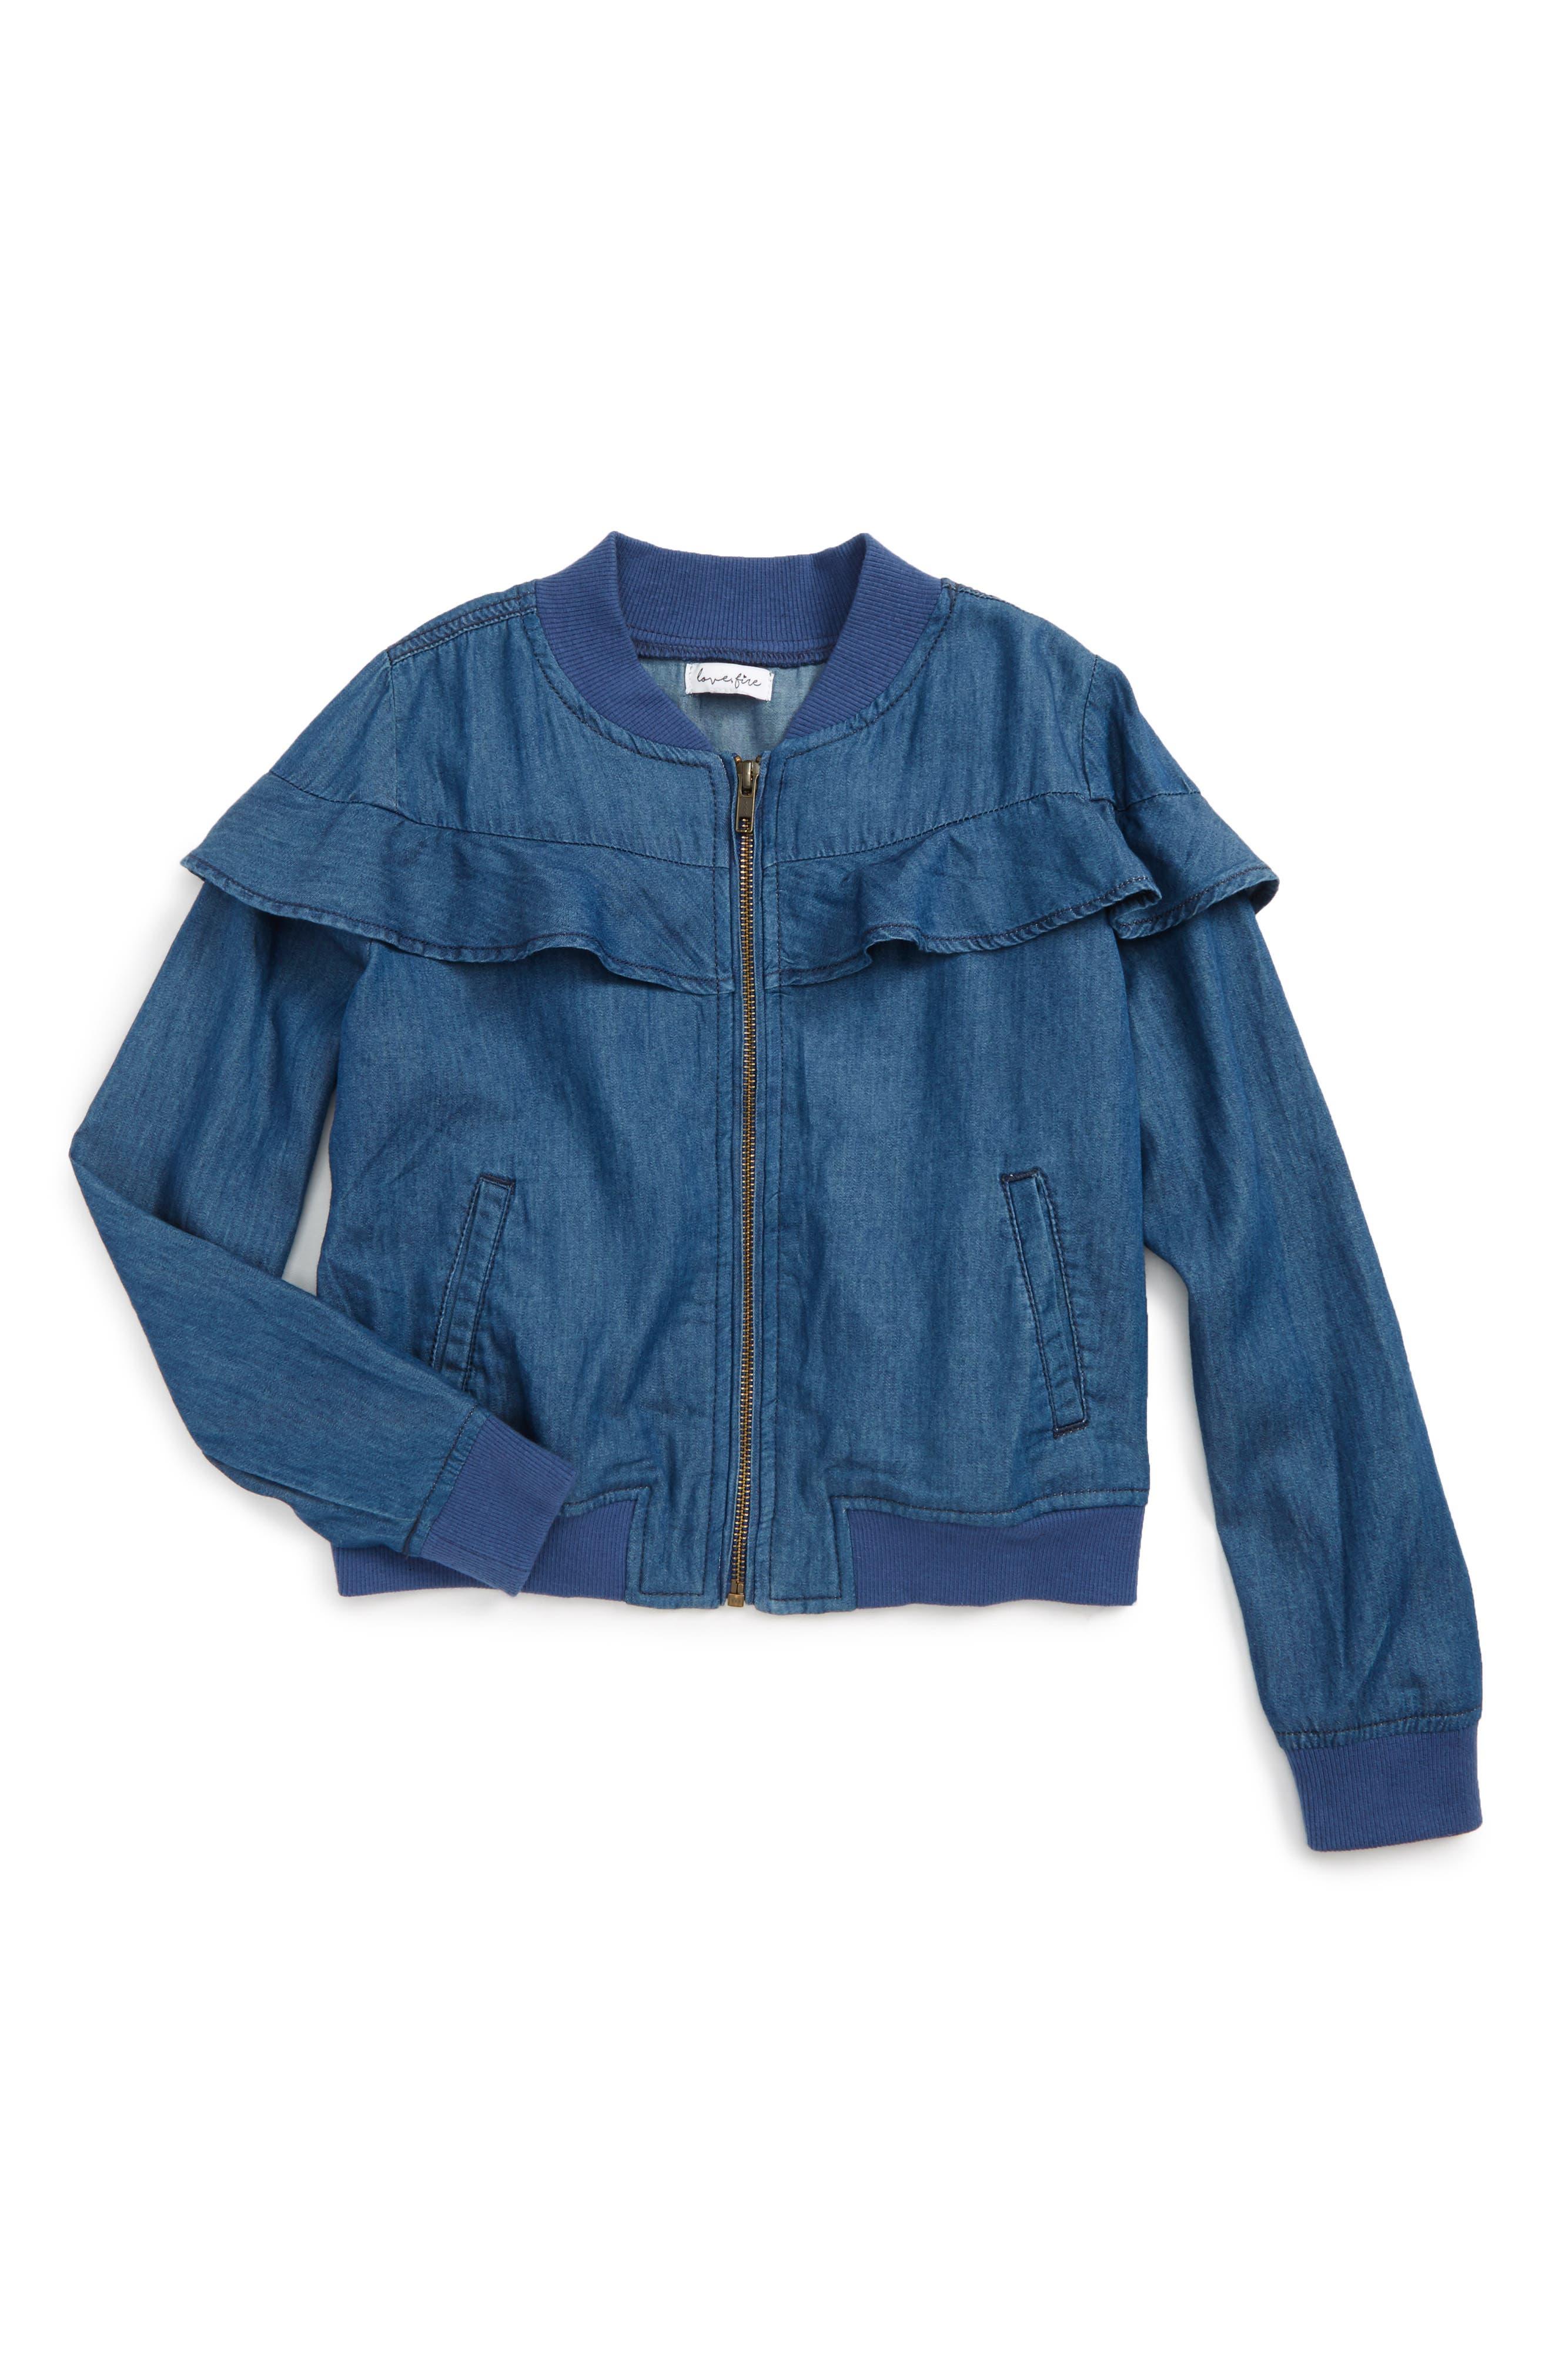 Main Image - Love, Fire Ruffle Denim Jacket (Big Girls)